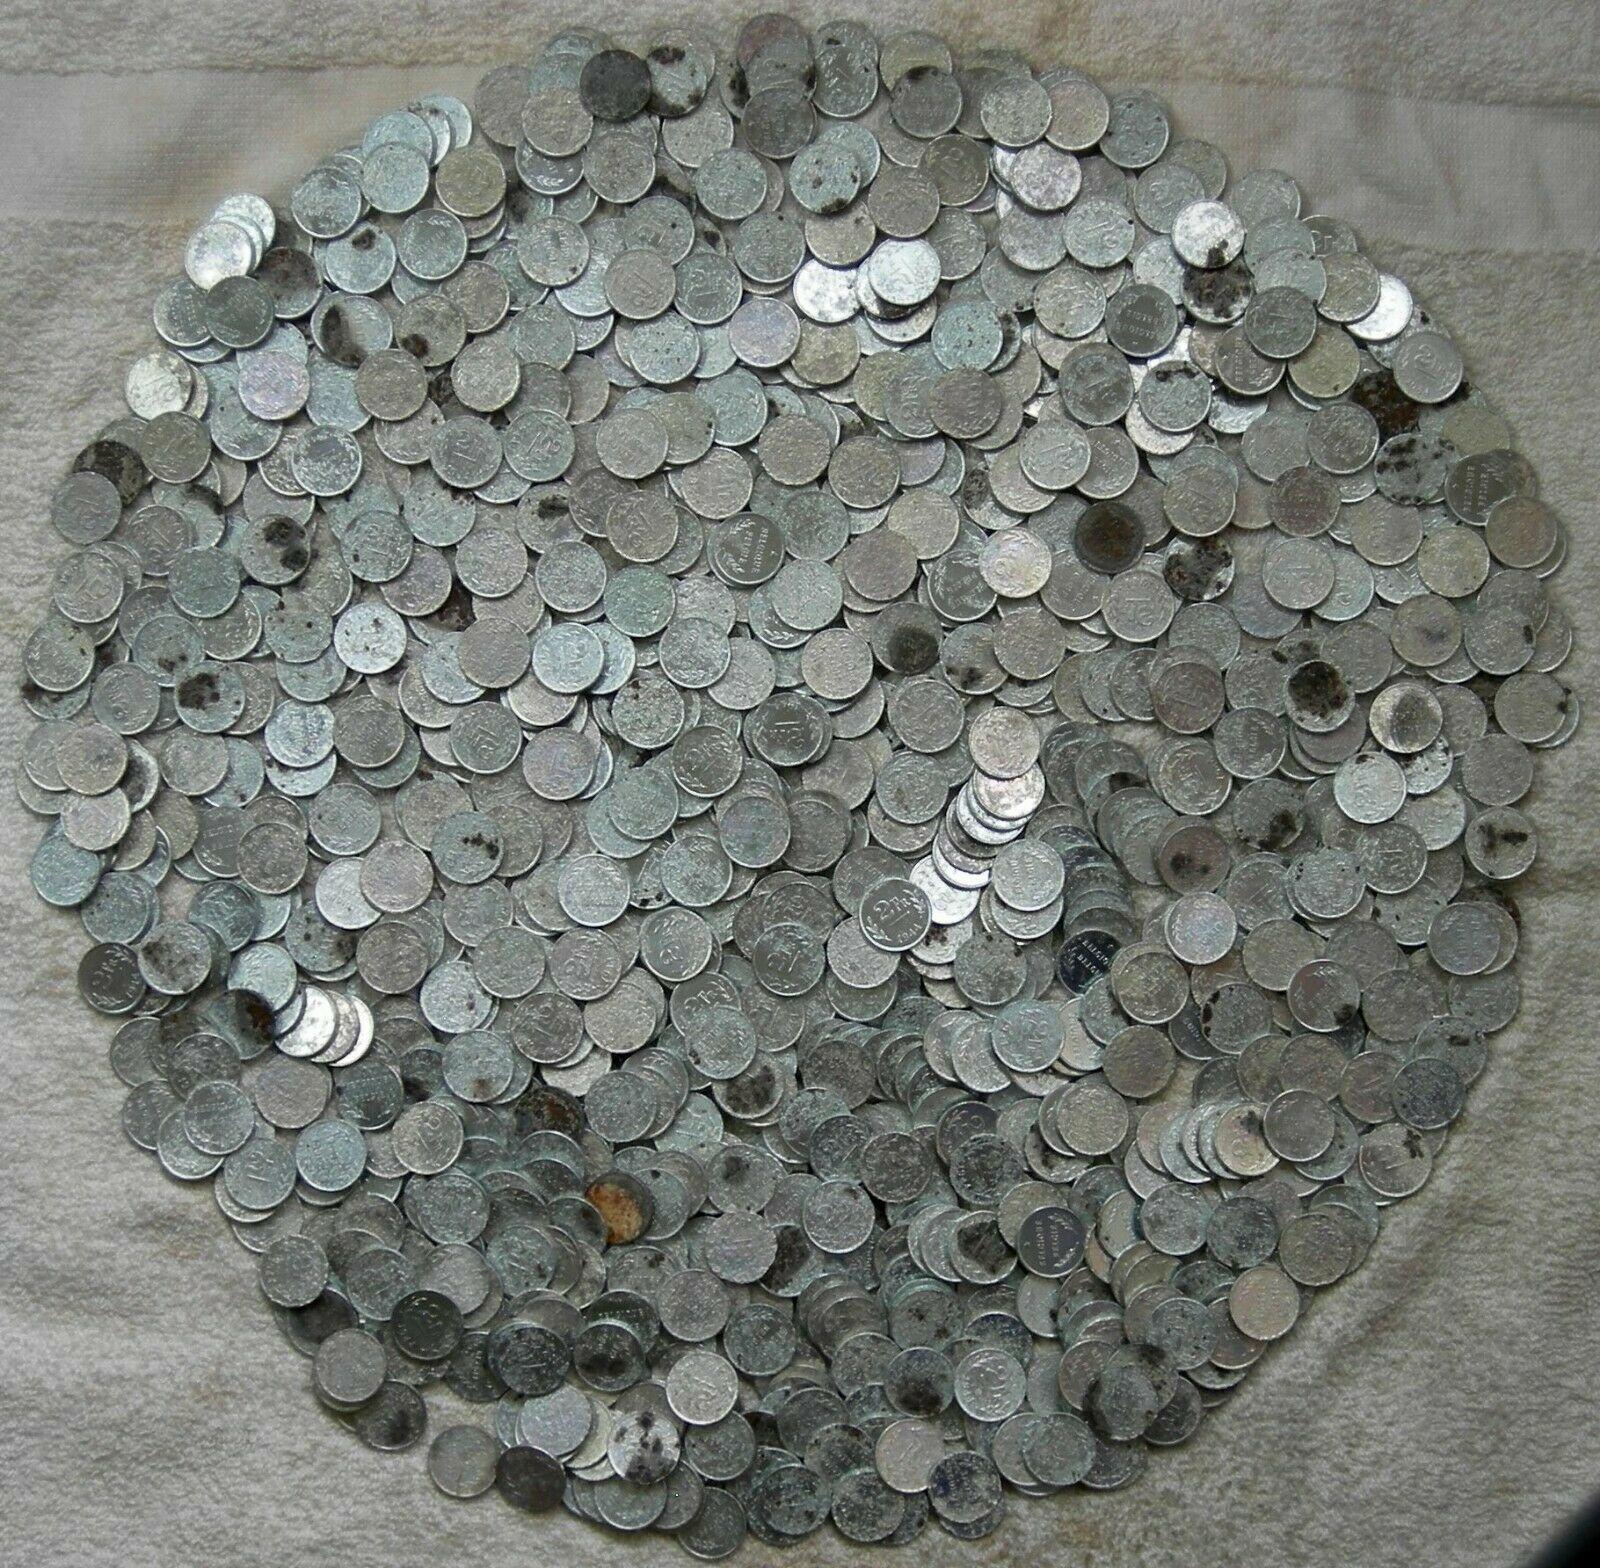 WHOLESALE 1000 BELGIUM COIN of LIBERATION (1944) by PHILADELPHIA MINT ZINC STEEL